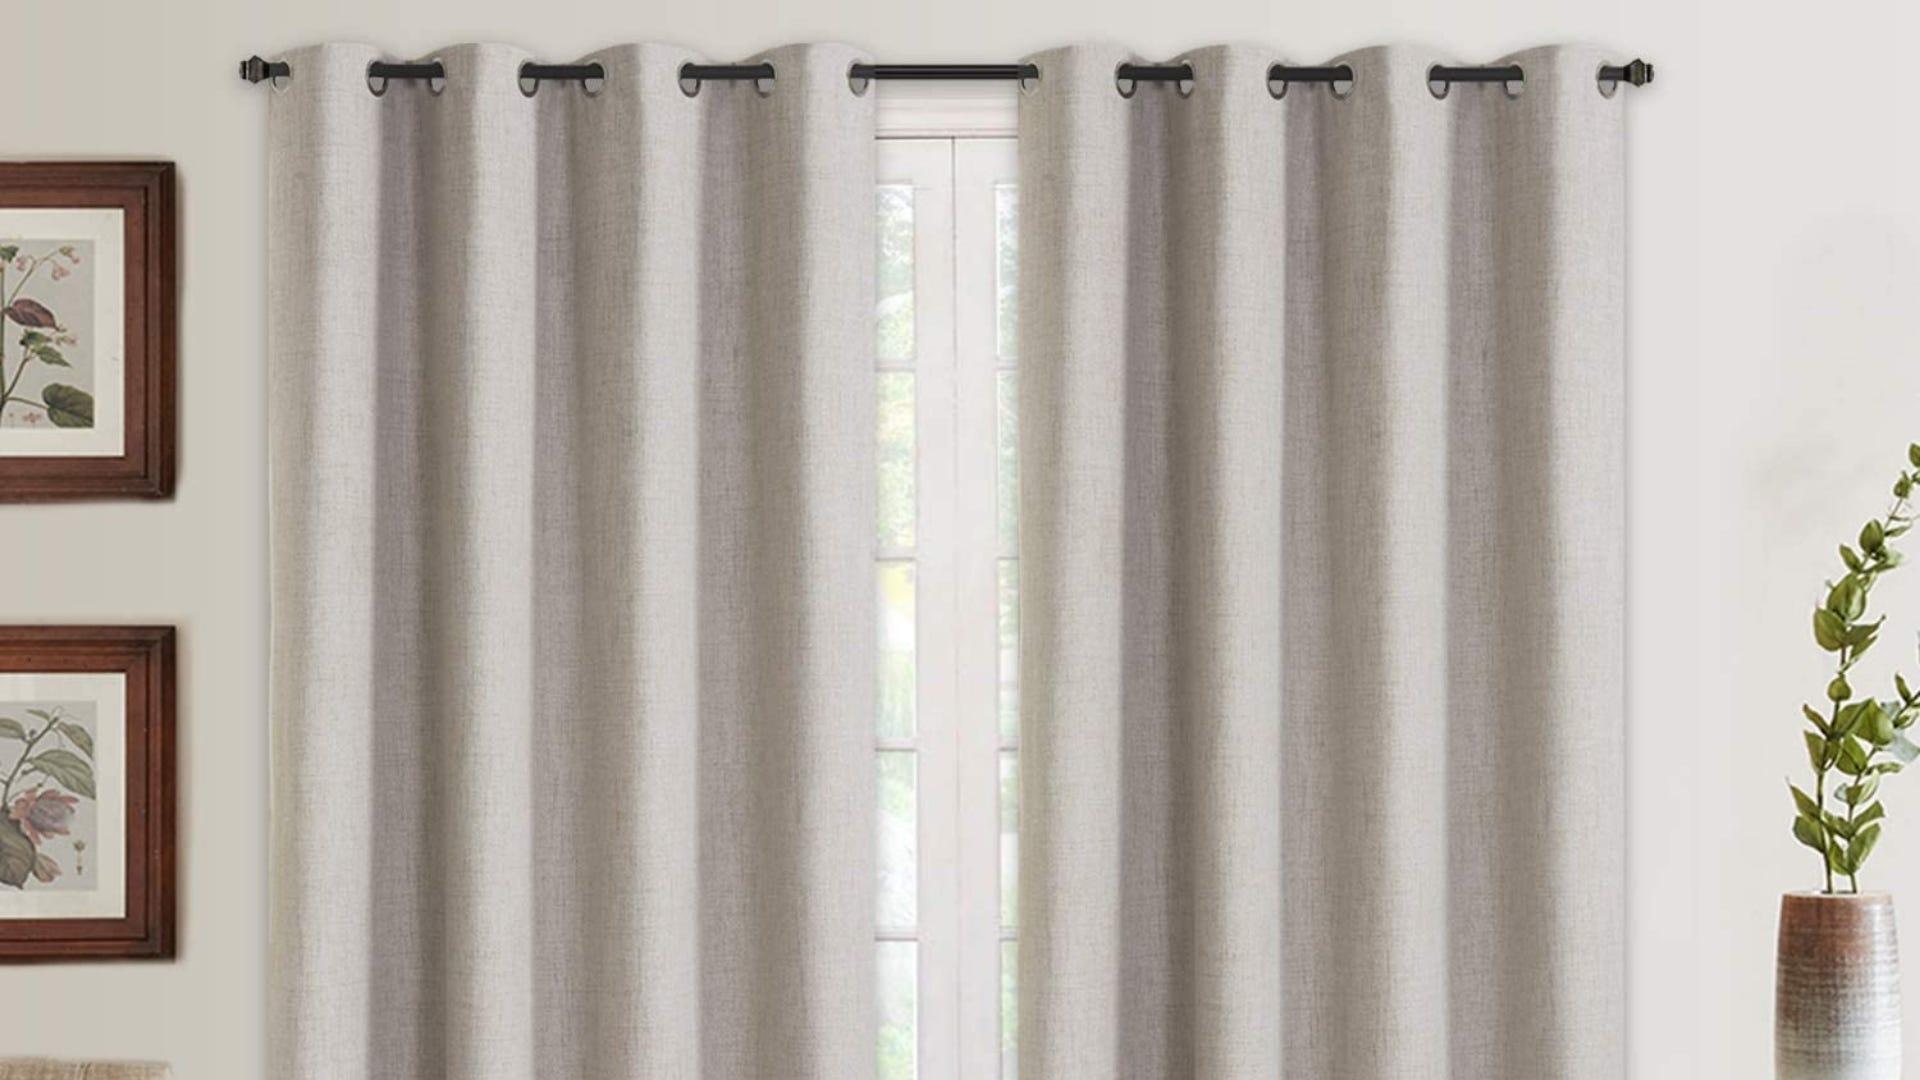 Beige linen curtains